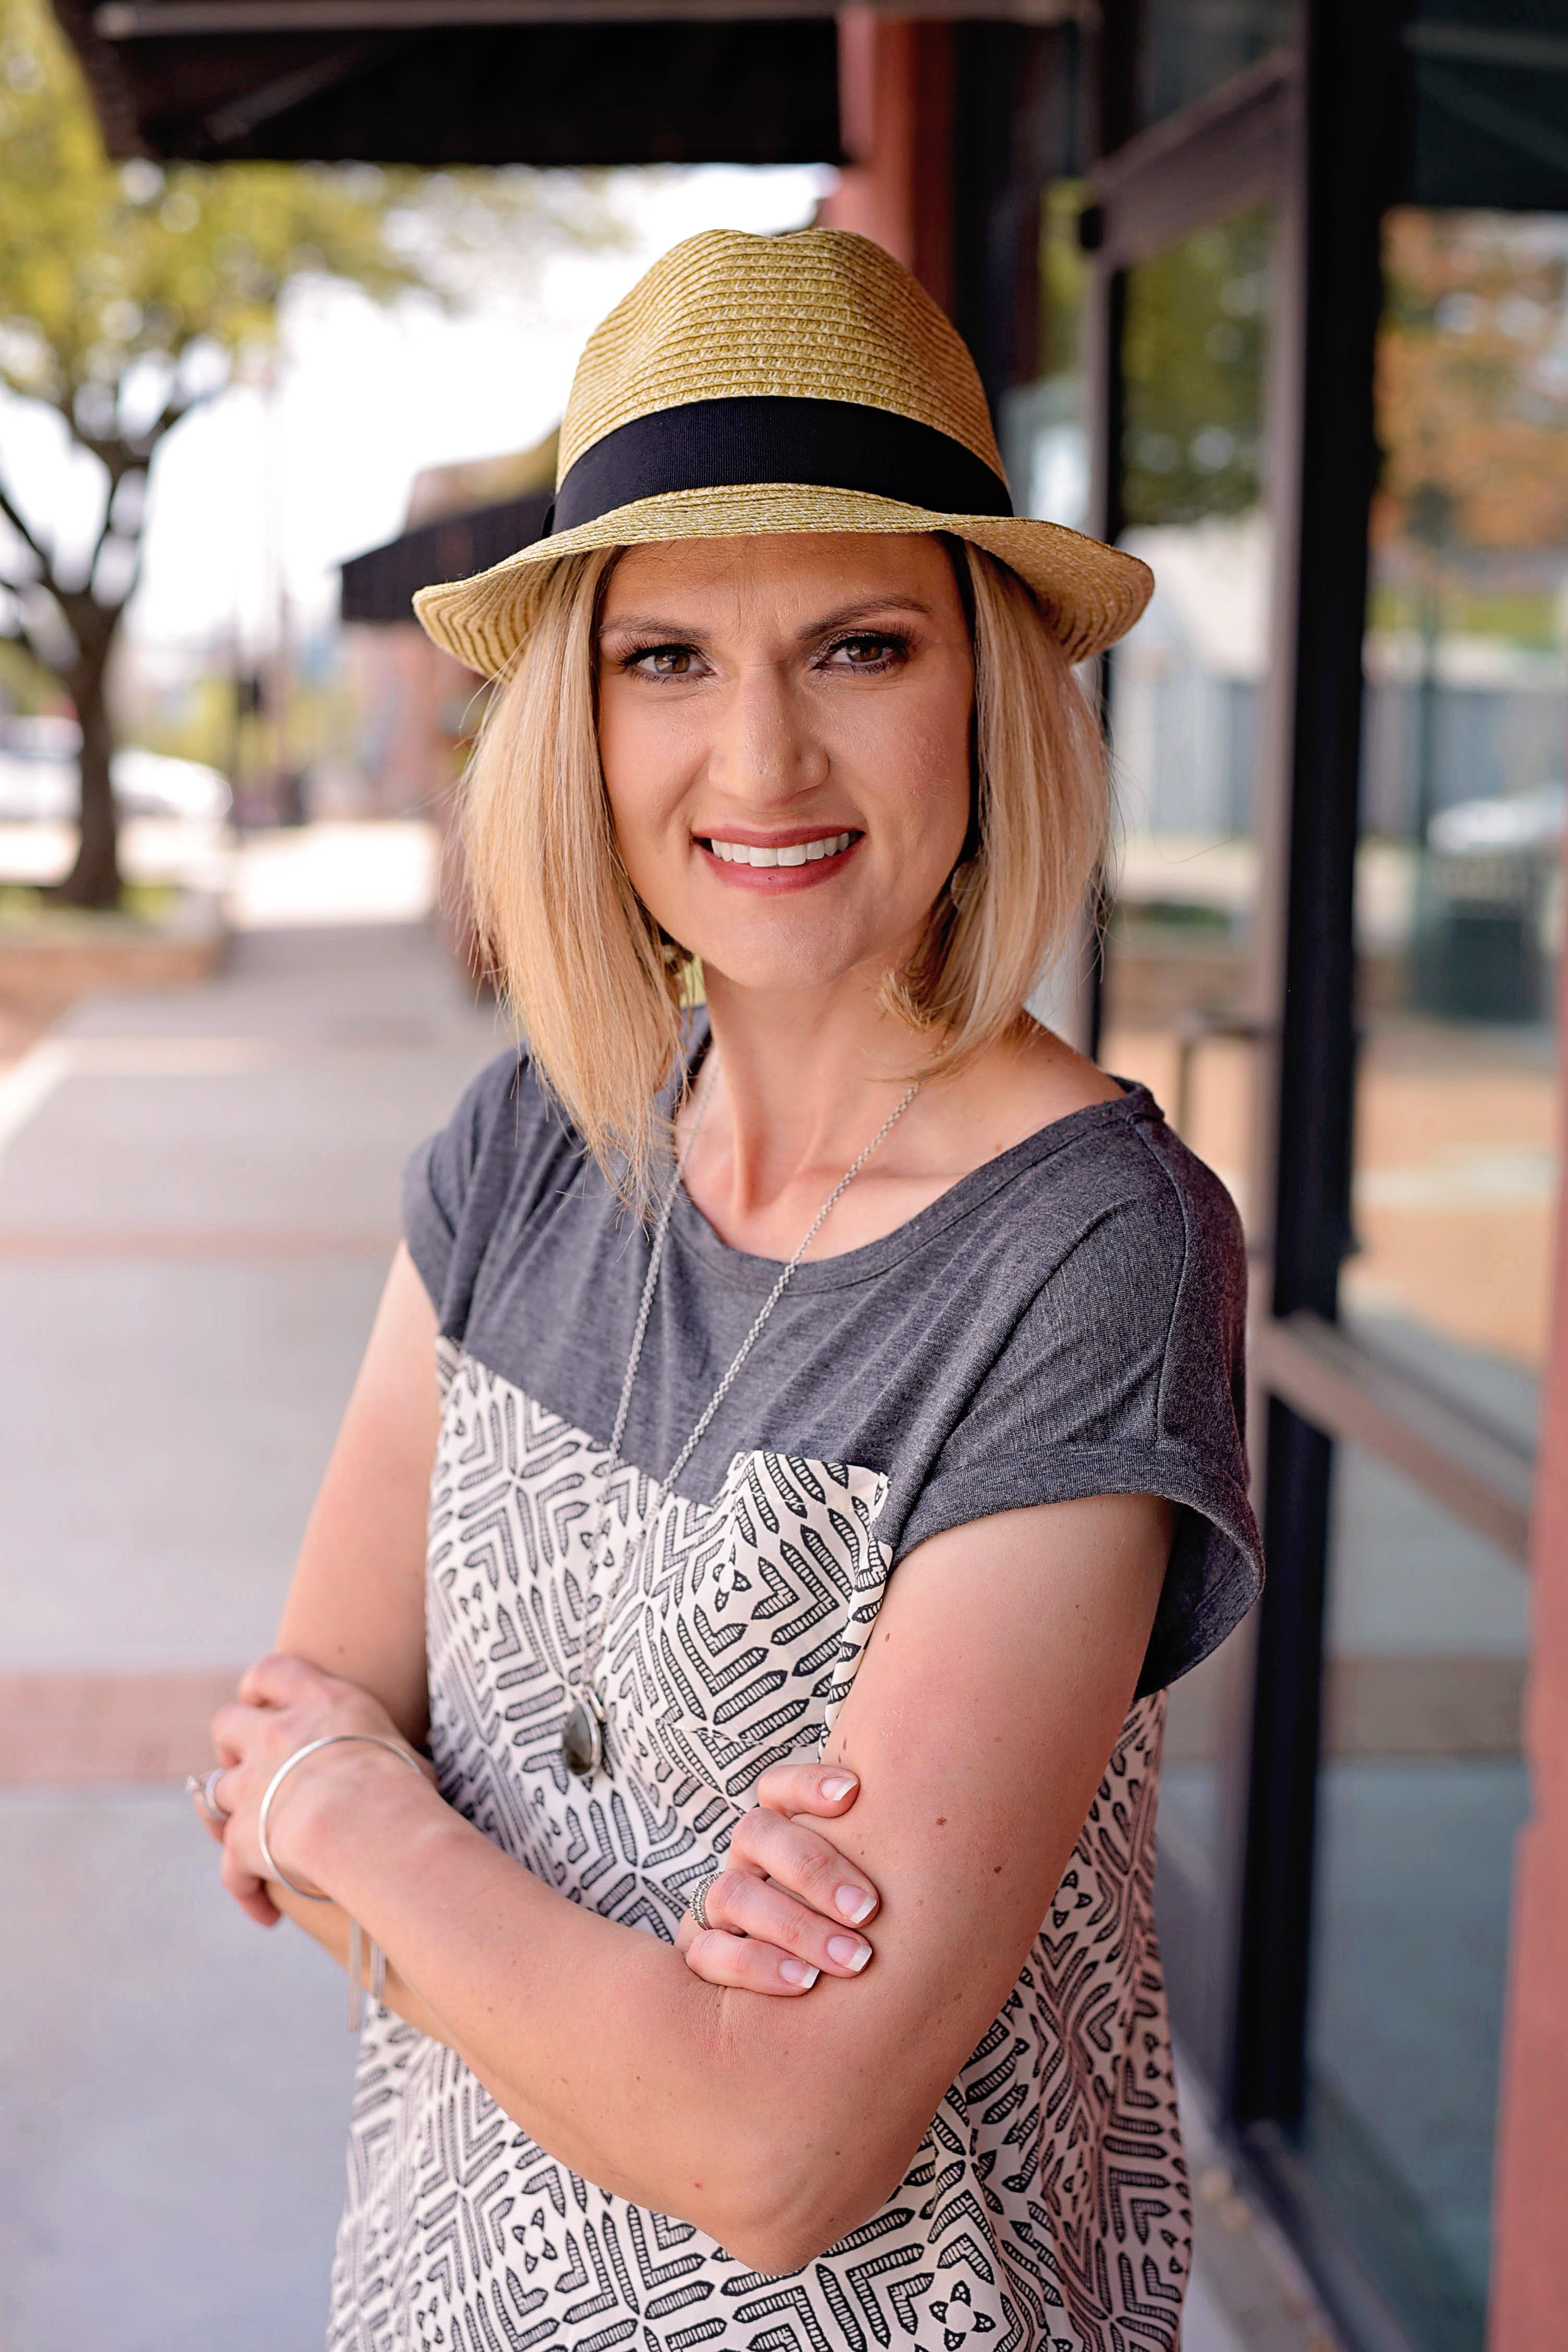 Beth Brinkmeyer